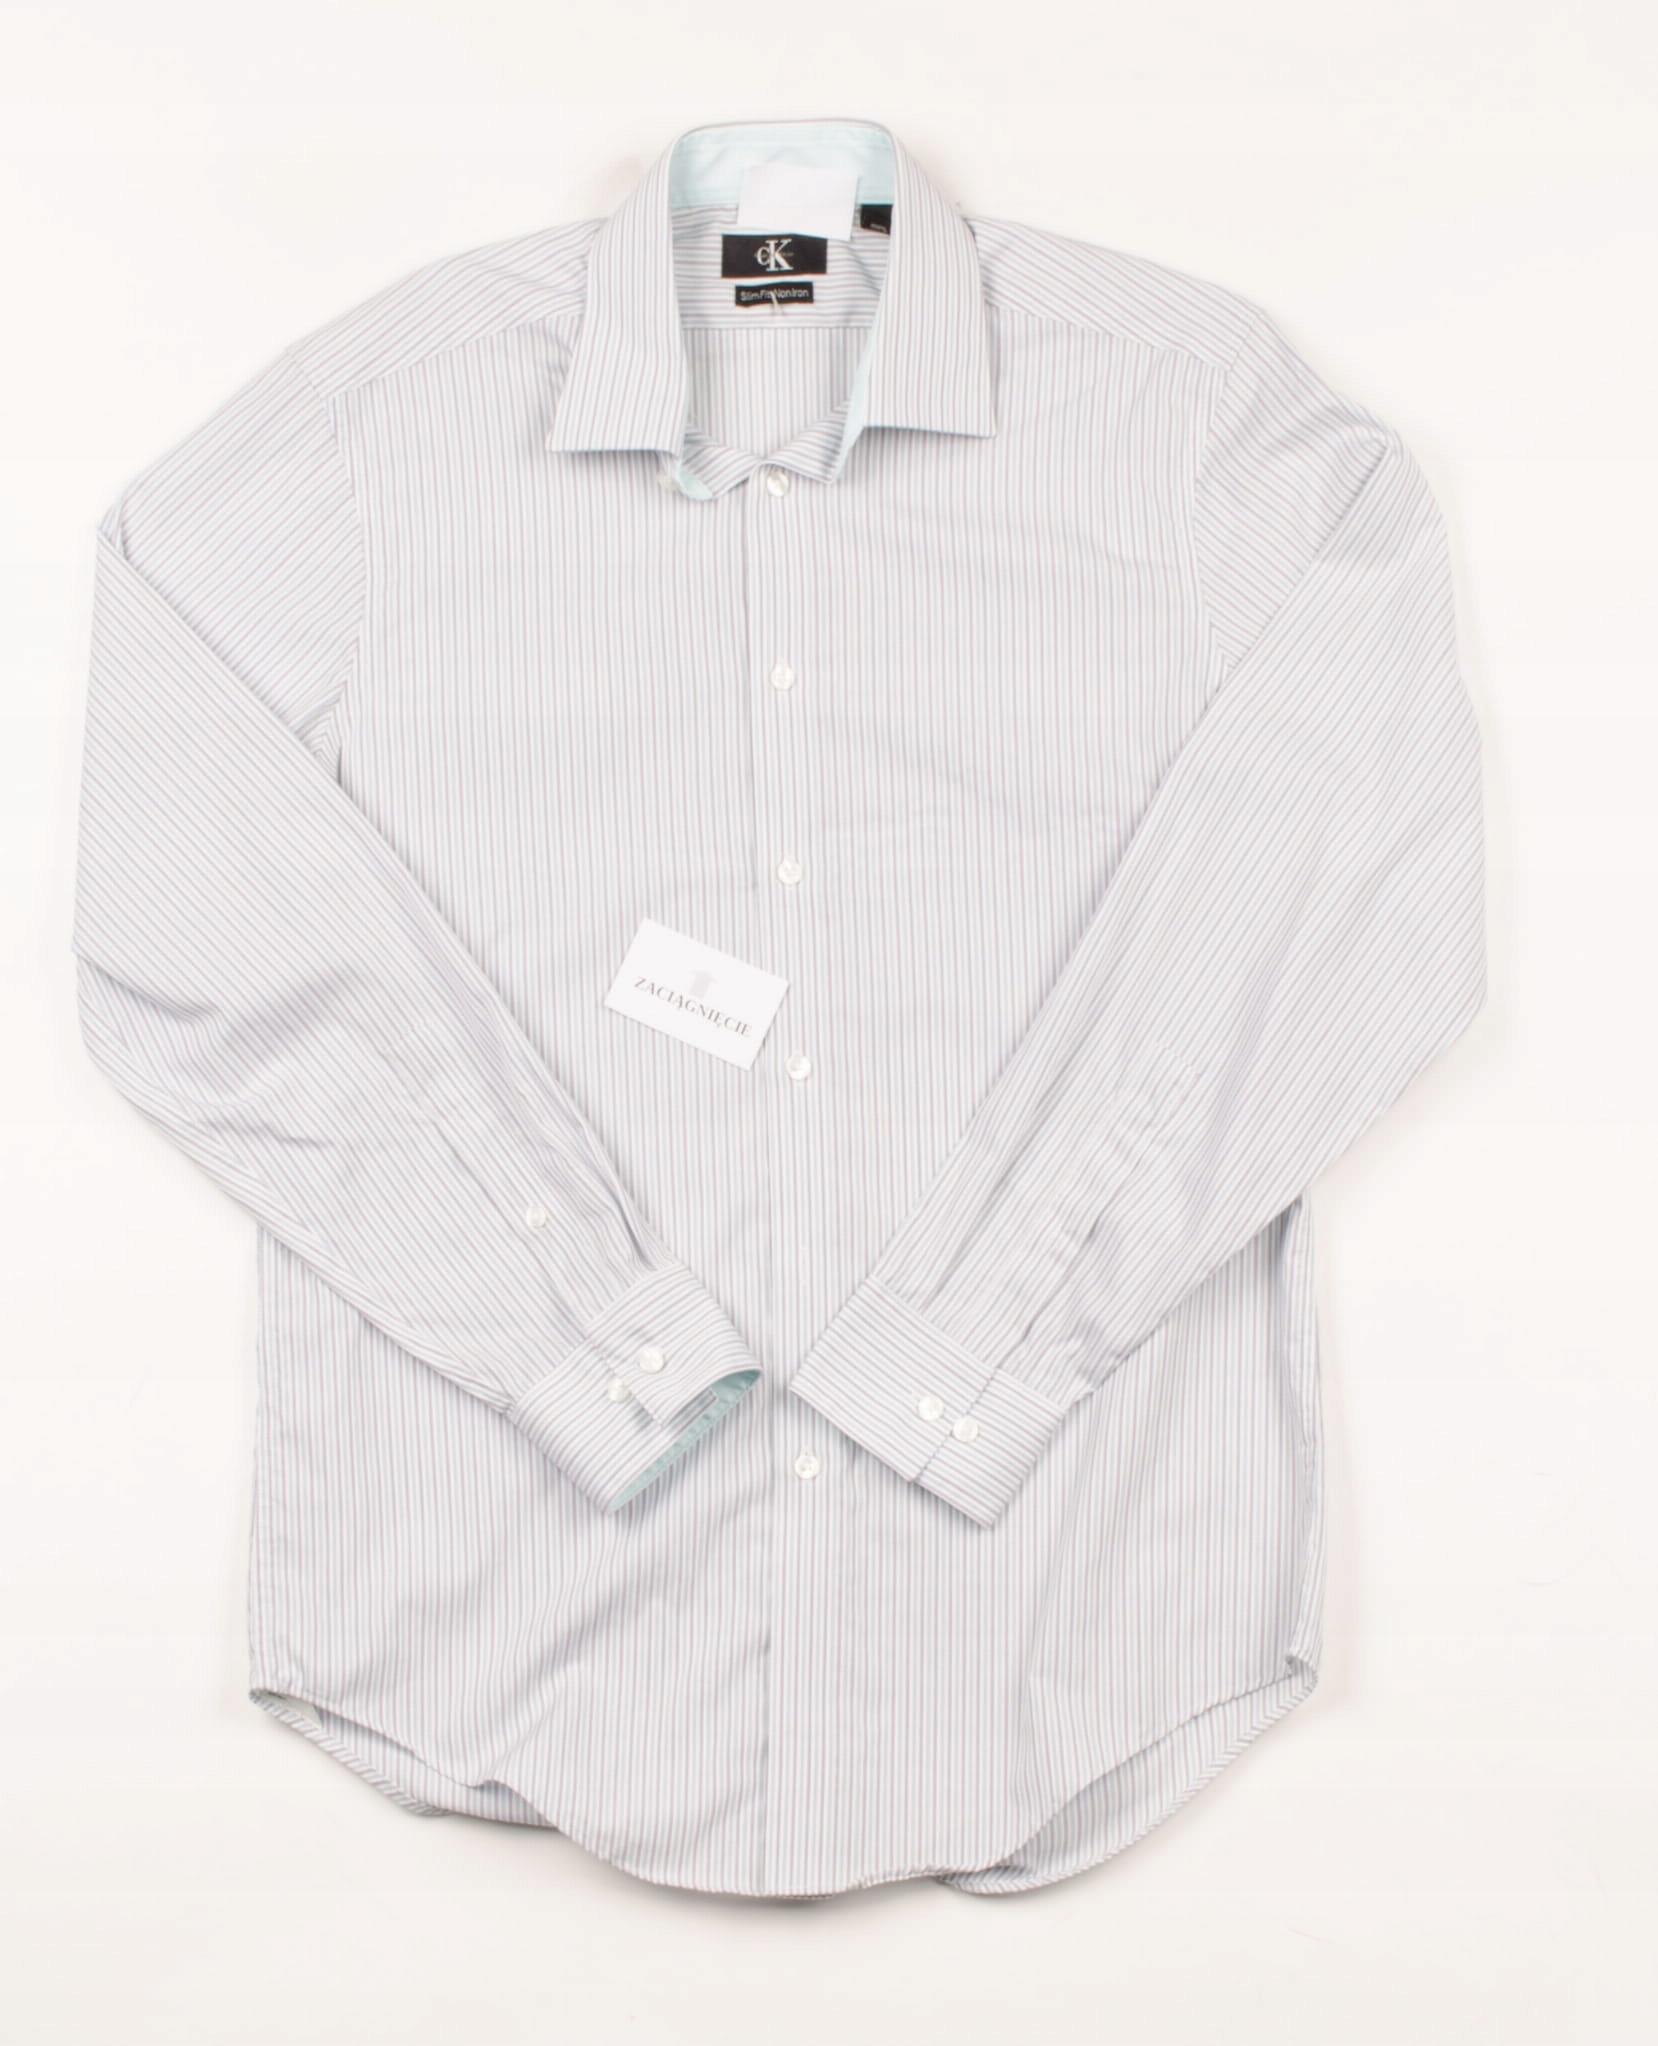 31904 MICRO WADA Calvin Klein Koszula Męska L